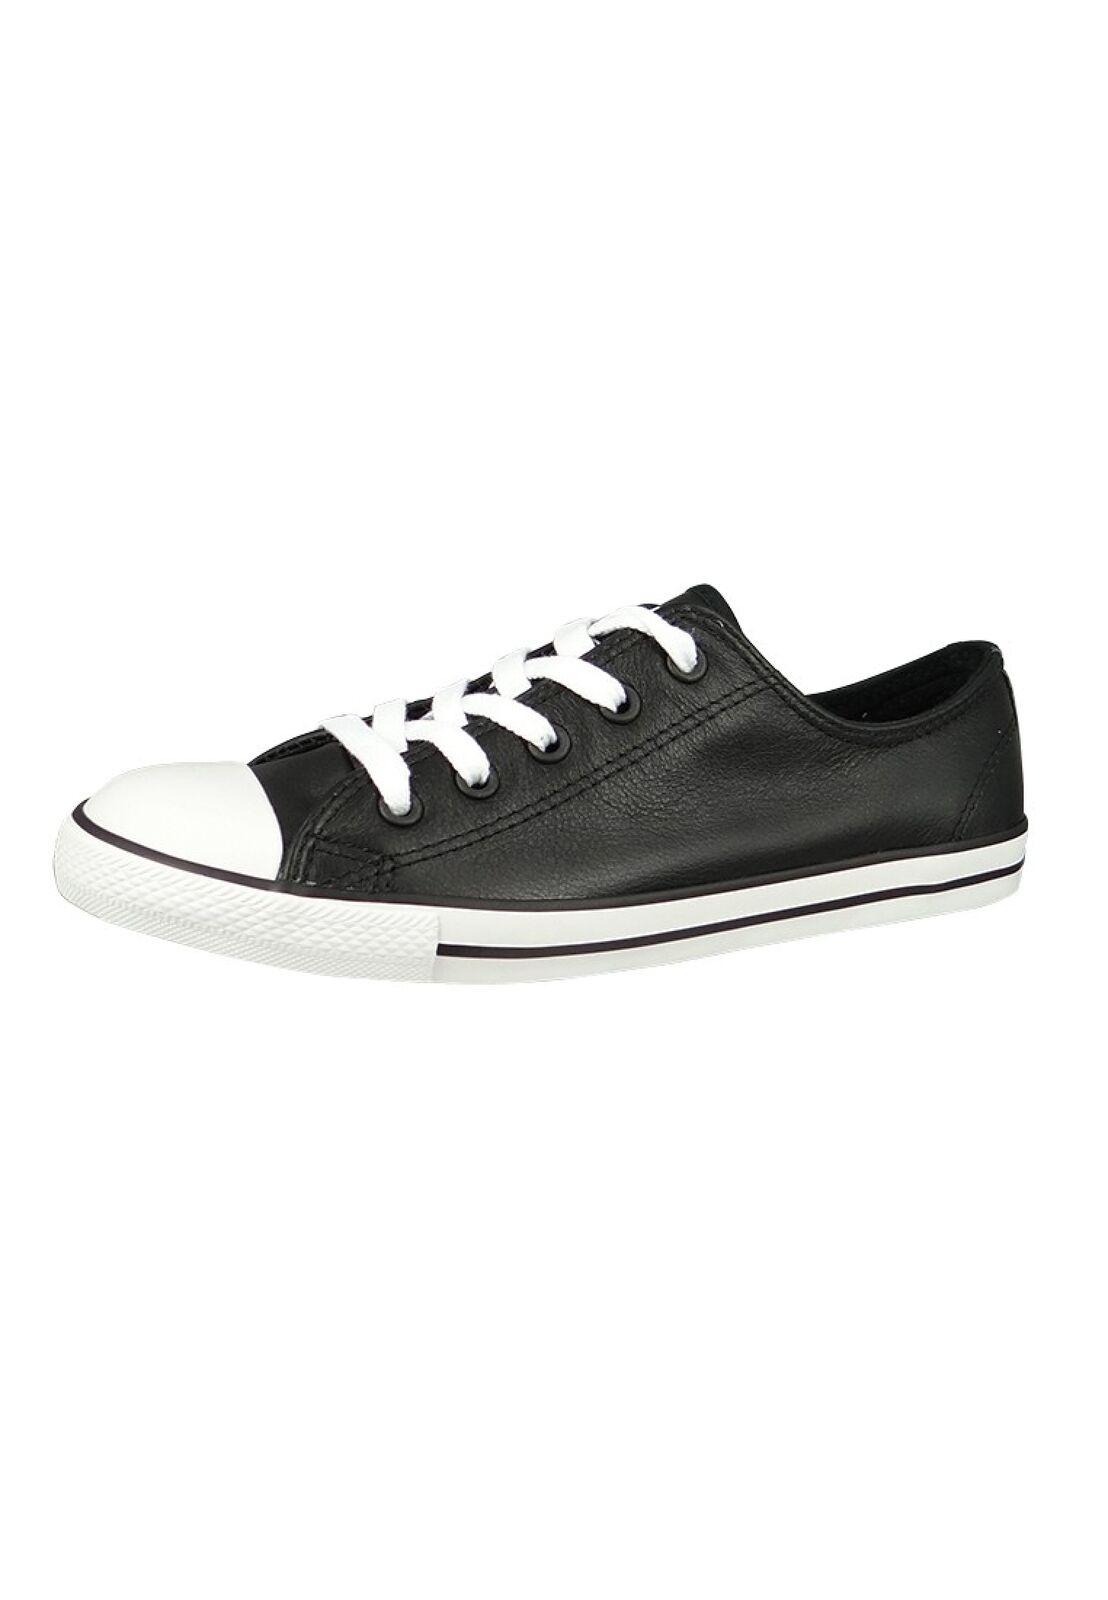 Converse Chucks 537107C Chuck Taylor AS Dainty OX Black black Gr. 36 - 41